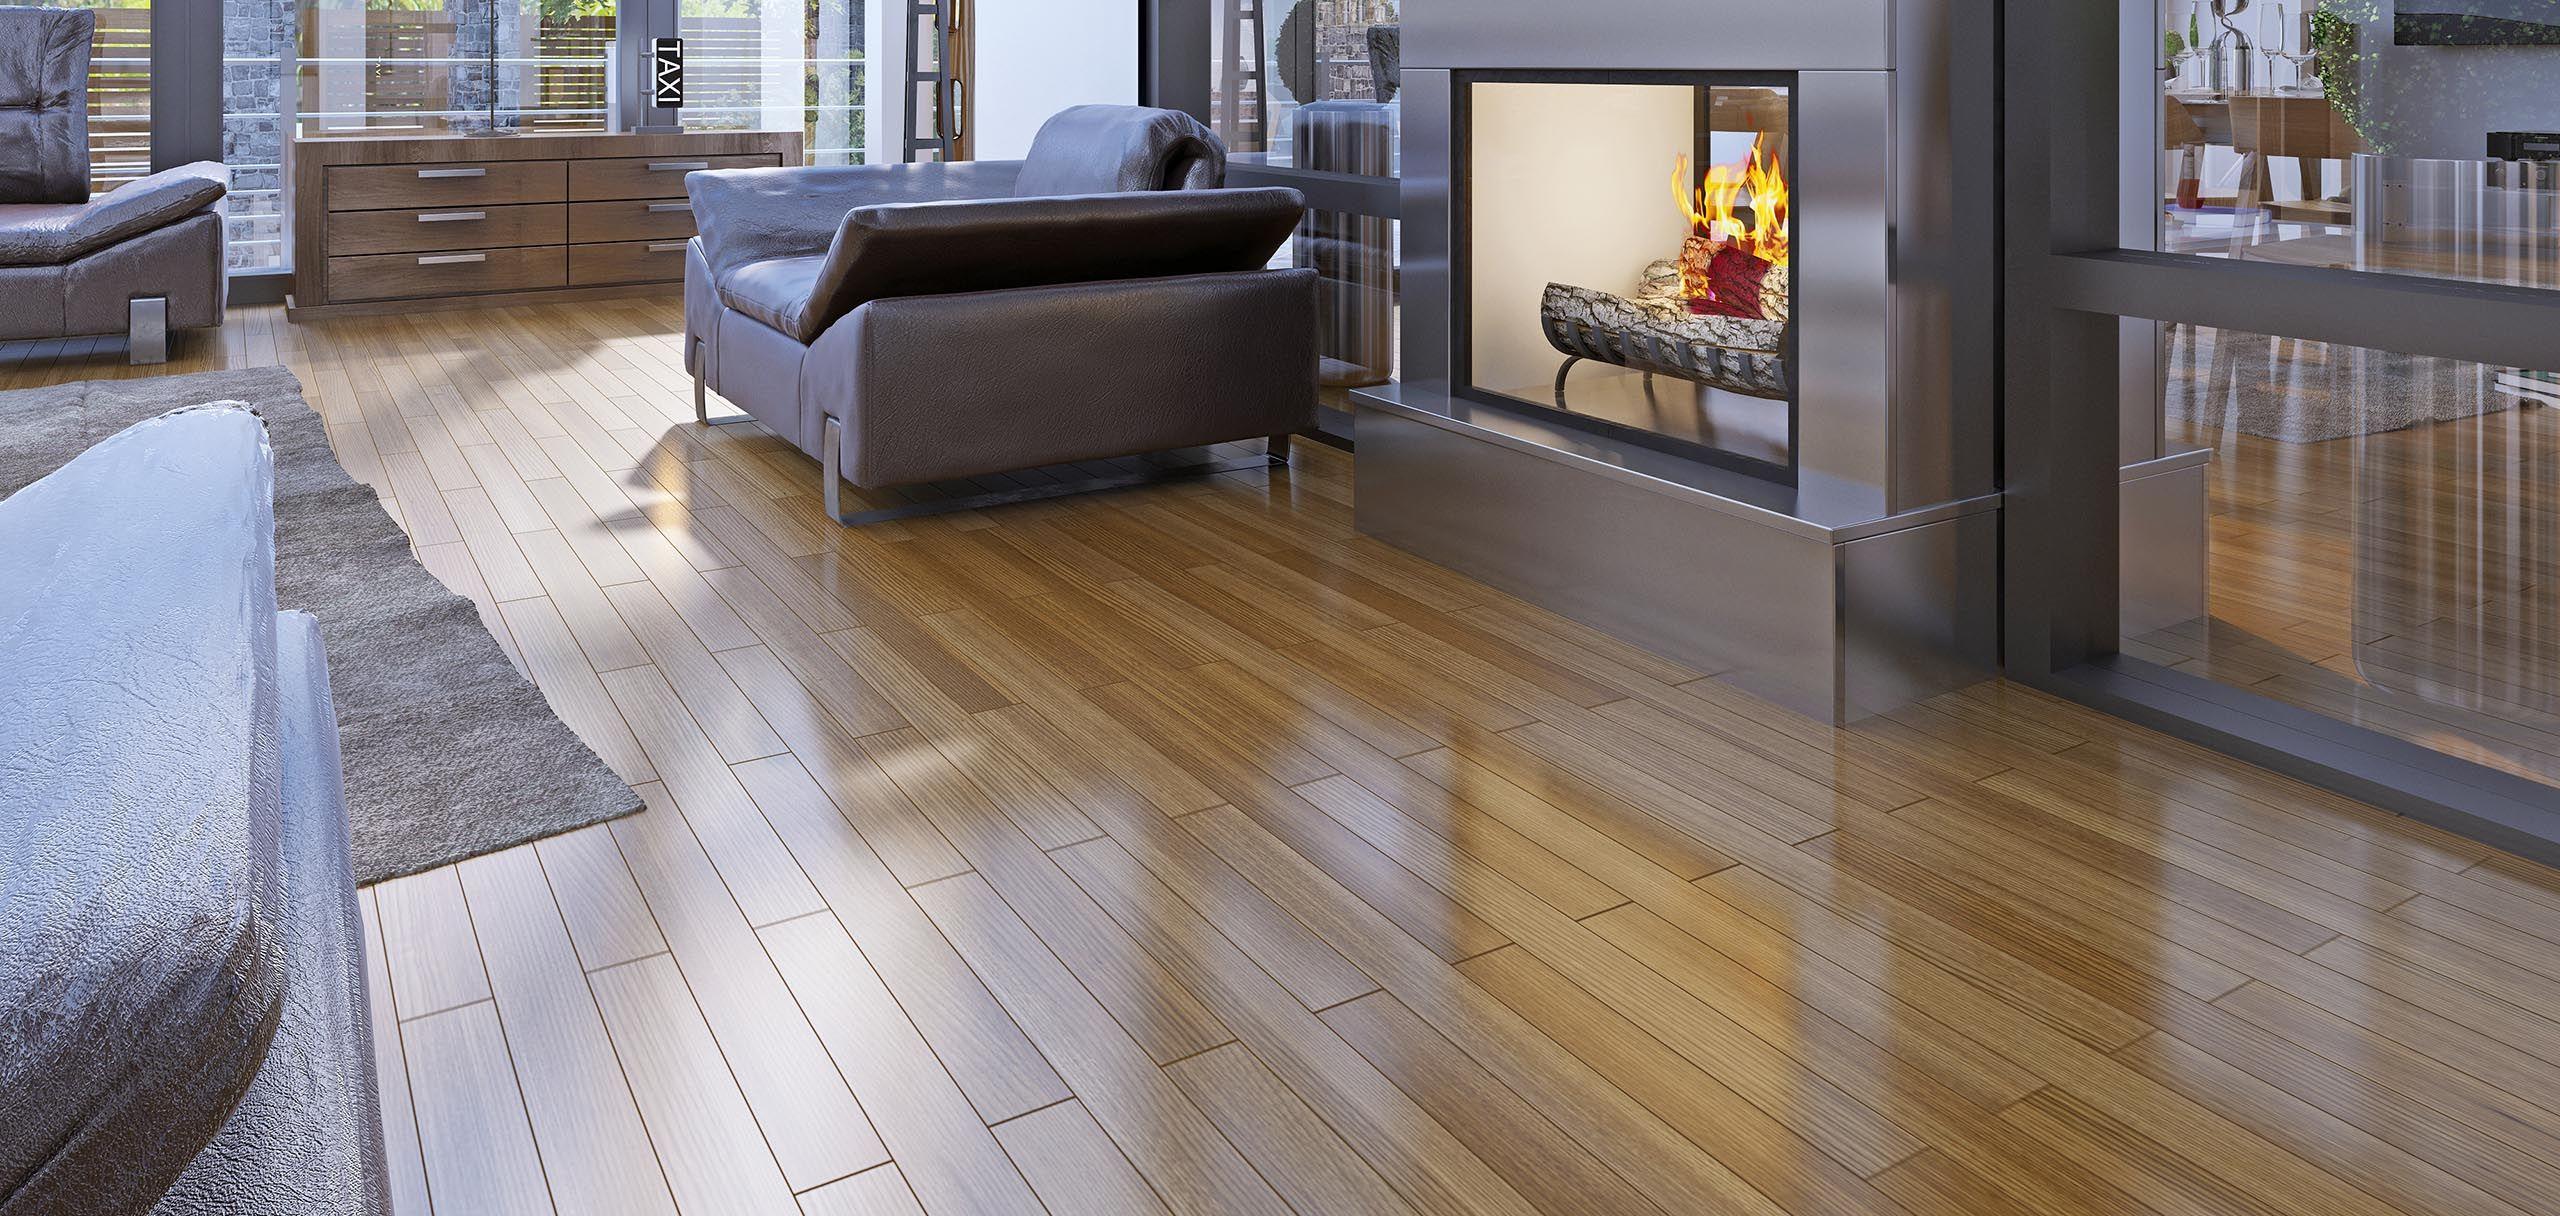 Kitchen Floor Tiles Belfast Wood Style Flooring Bangor Flooring Belfast Wood Flooring